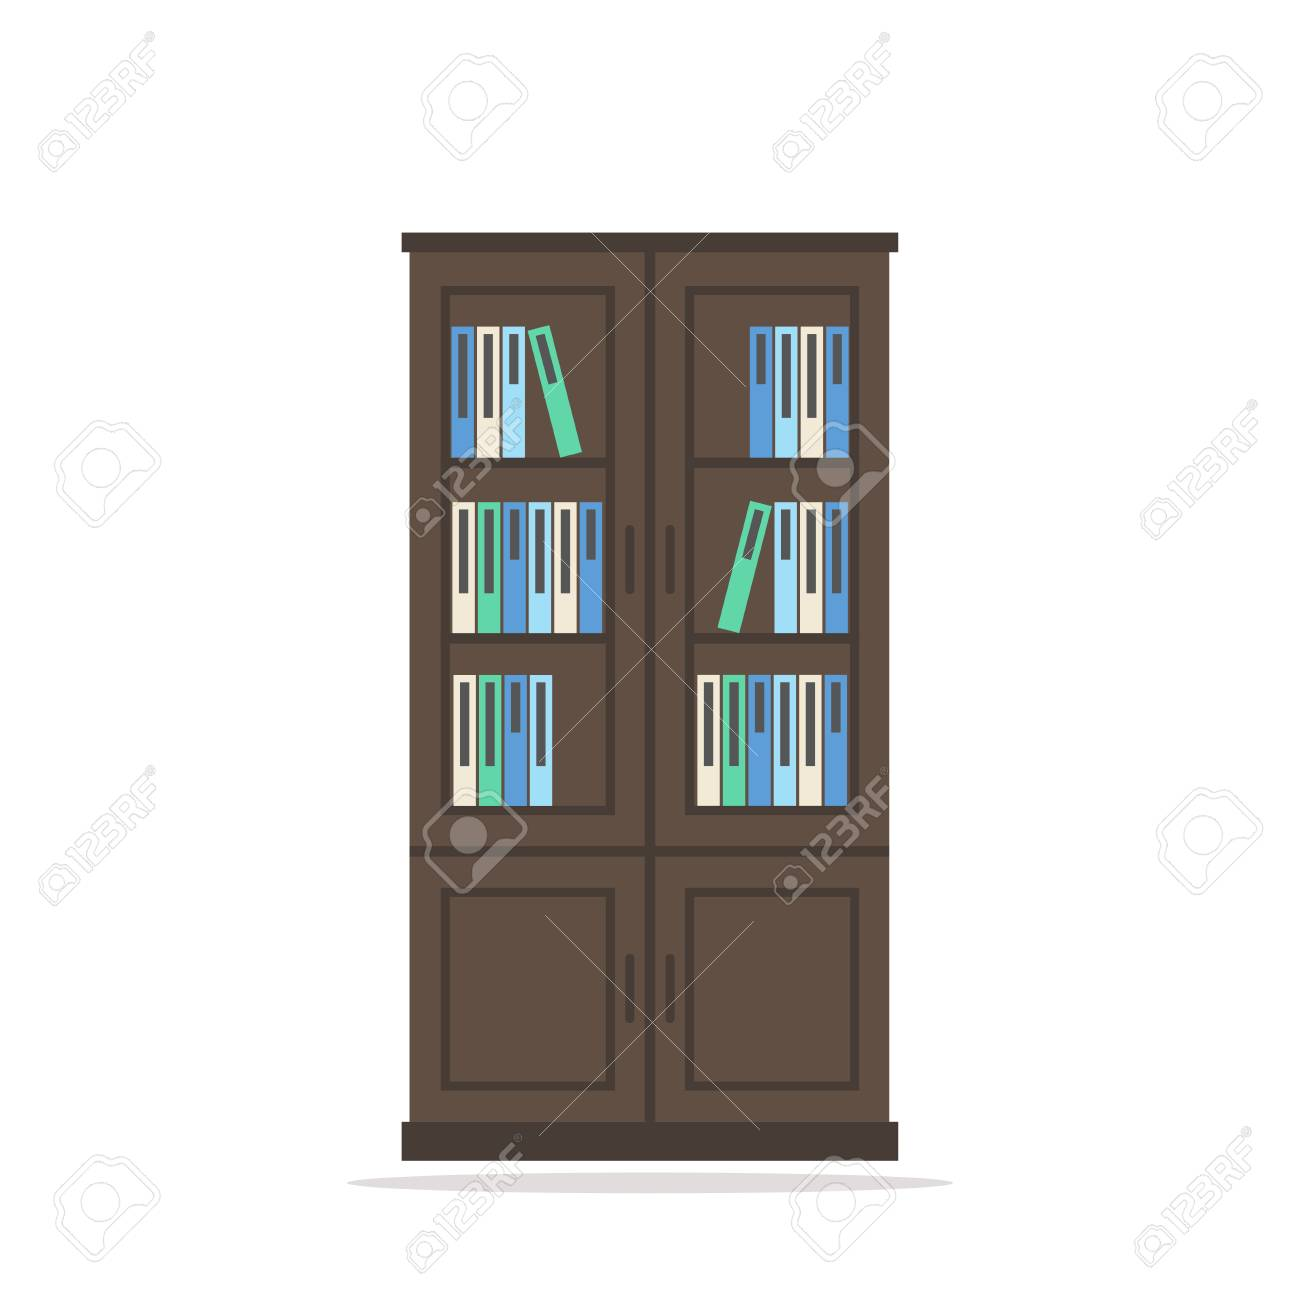 boekenkast gesoleerd boekenkast icoon grote houten boekenkast met boeken op een witte achtergrond